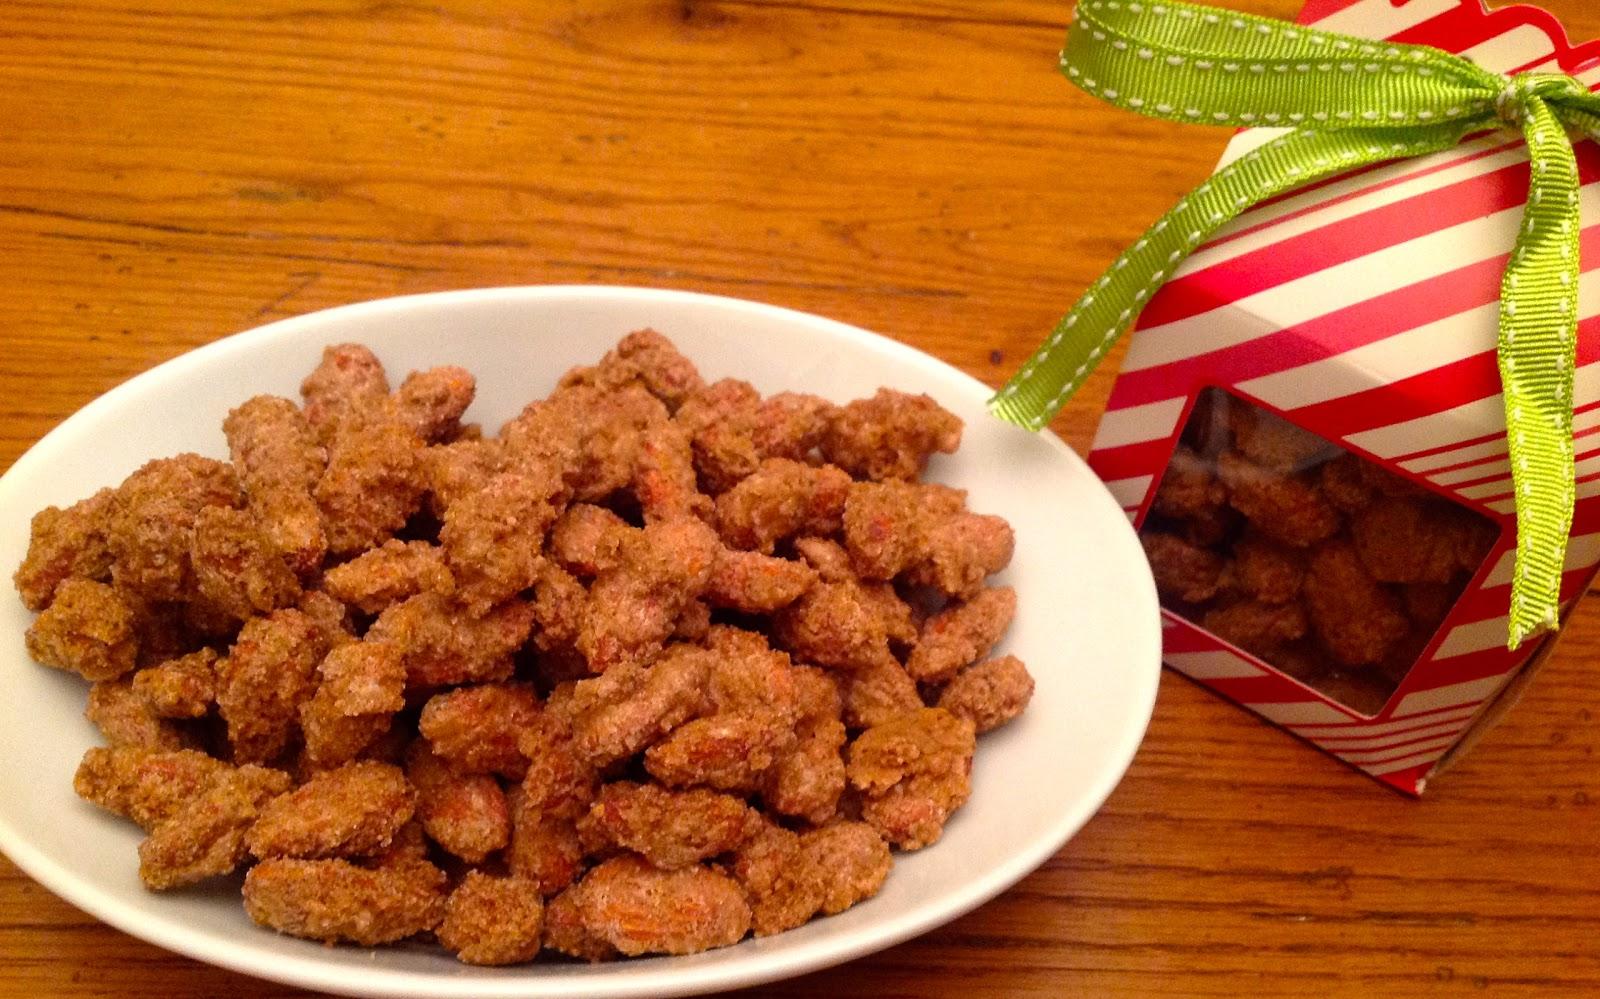 Dawn's Recipes: Cinnamon Roasted Almonds